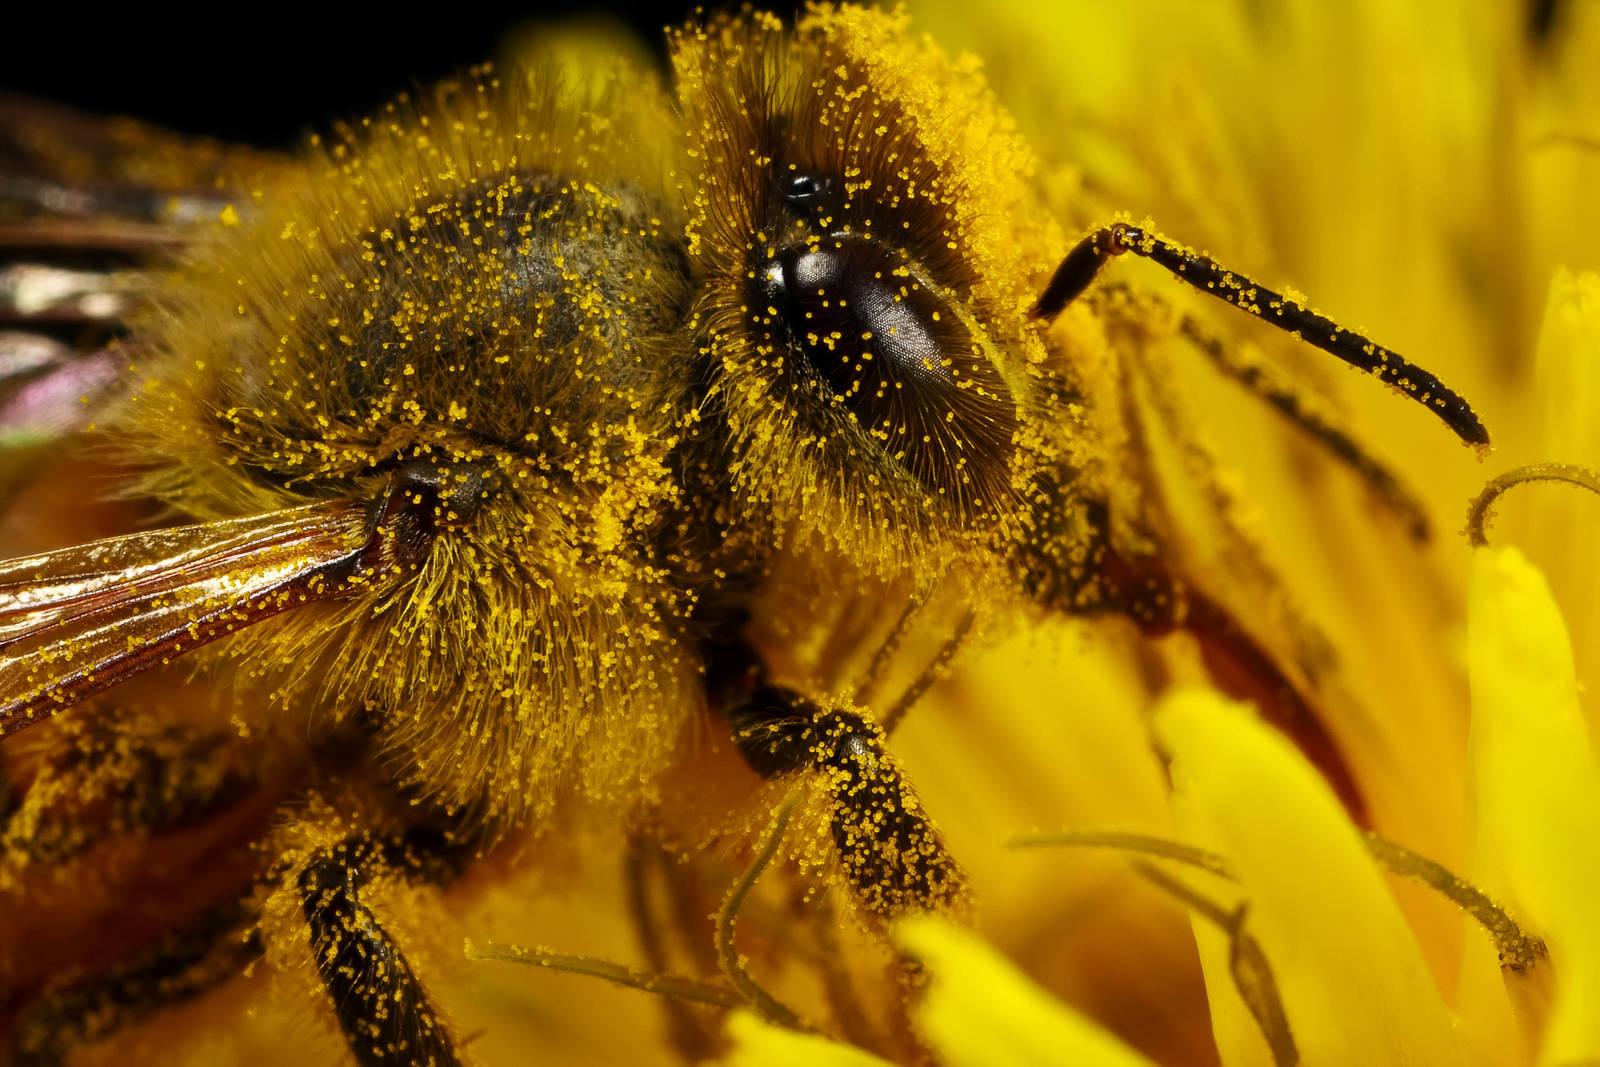 Pollen Duster by dalantech